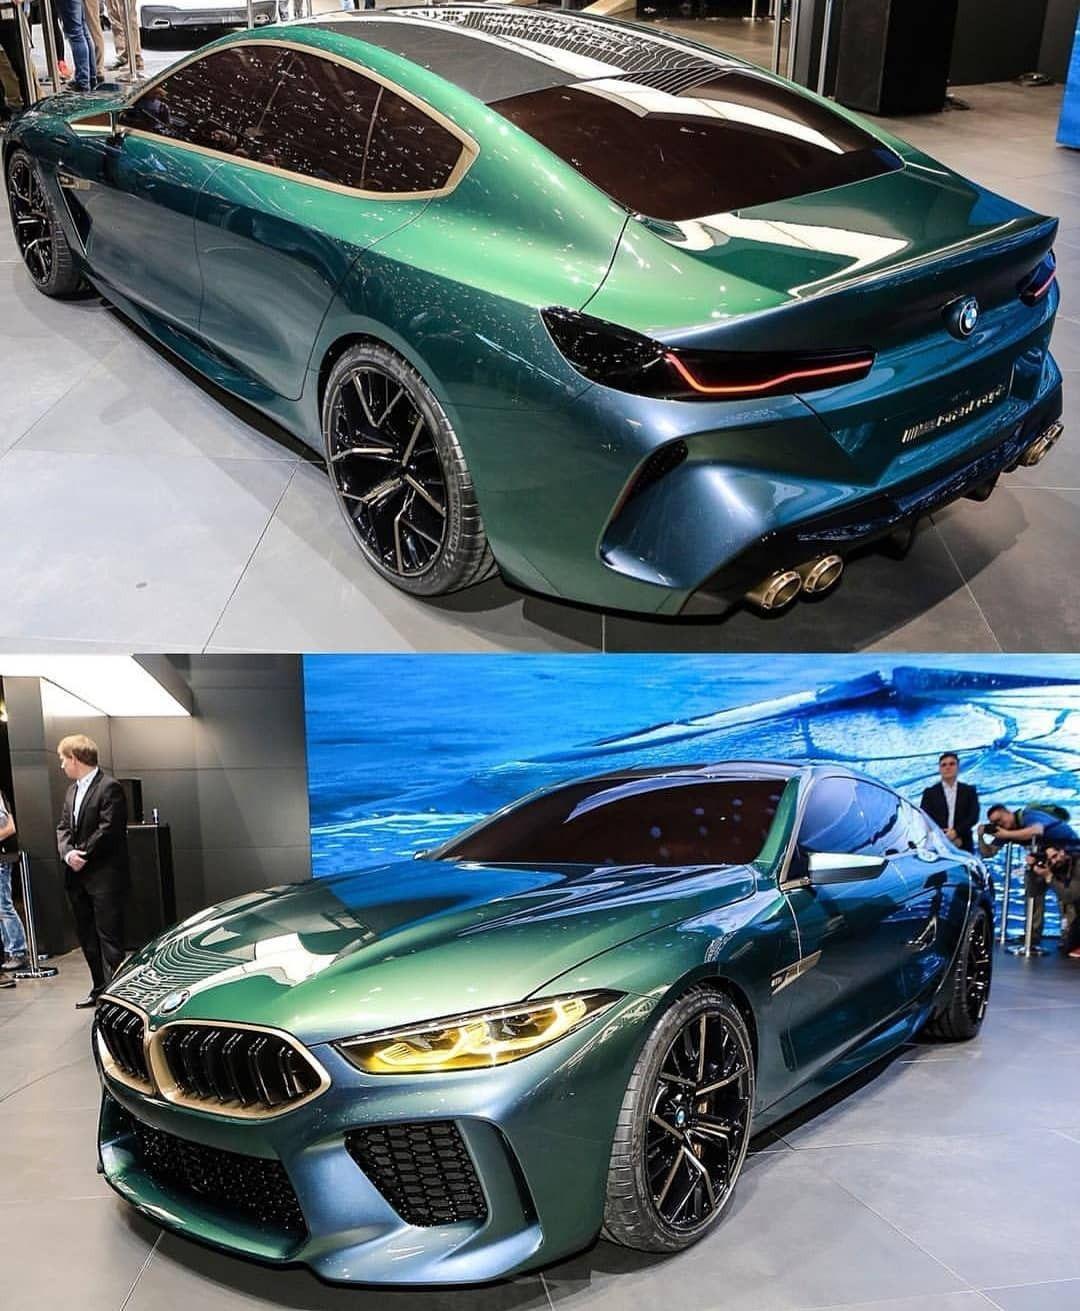 Bmw Concept M8 Gran Coupe Bmw Concept Bmw Coupe Cars